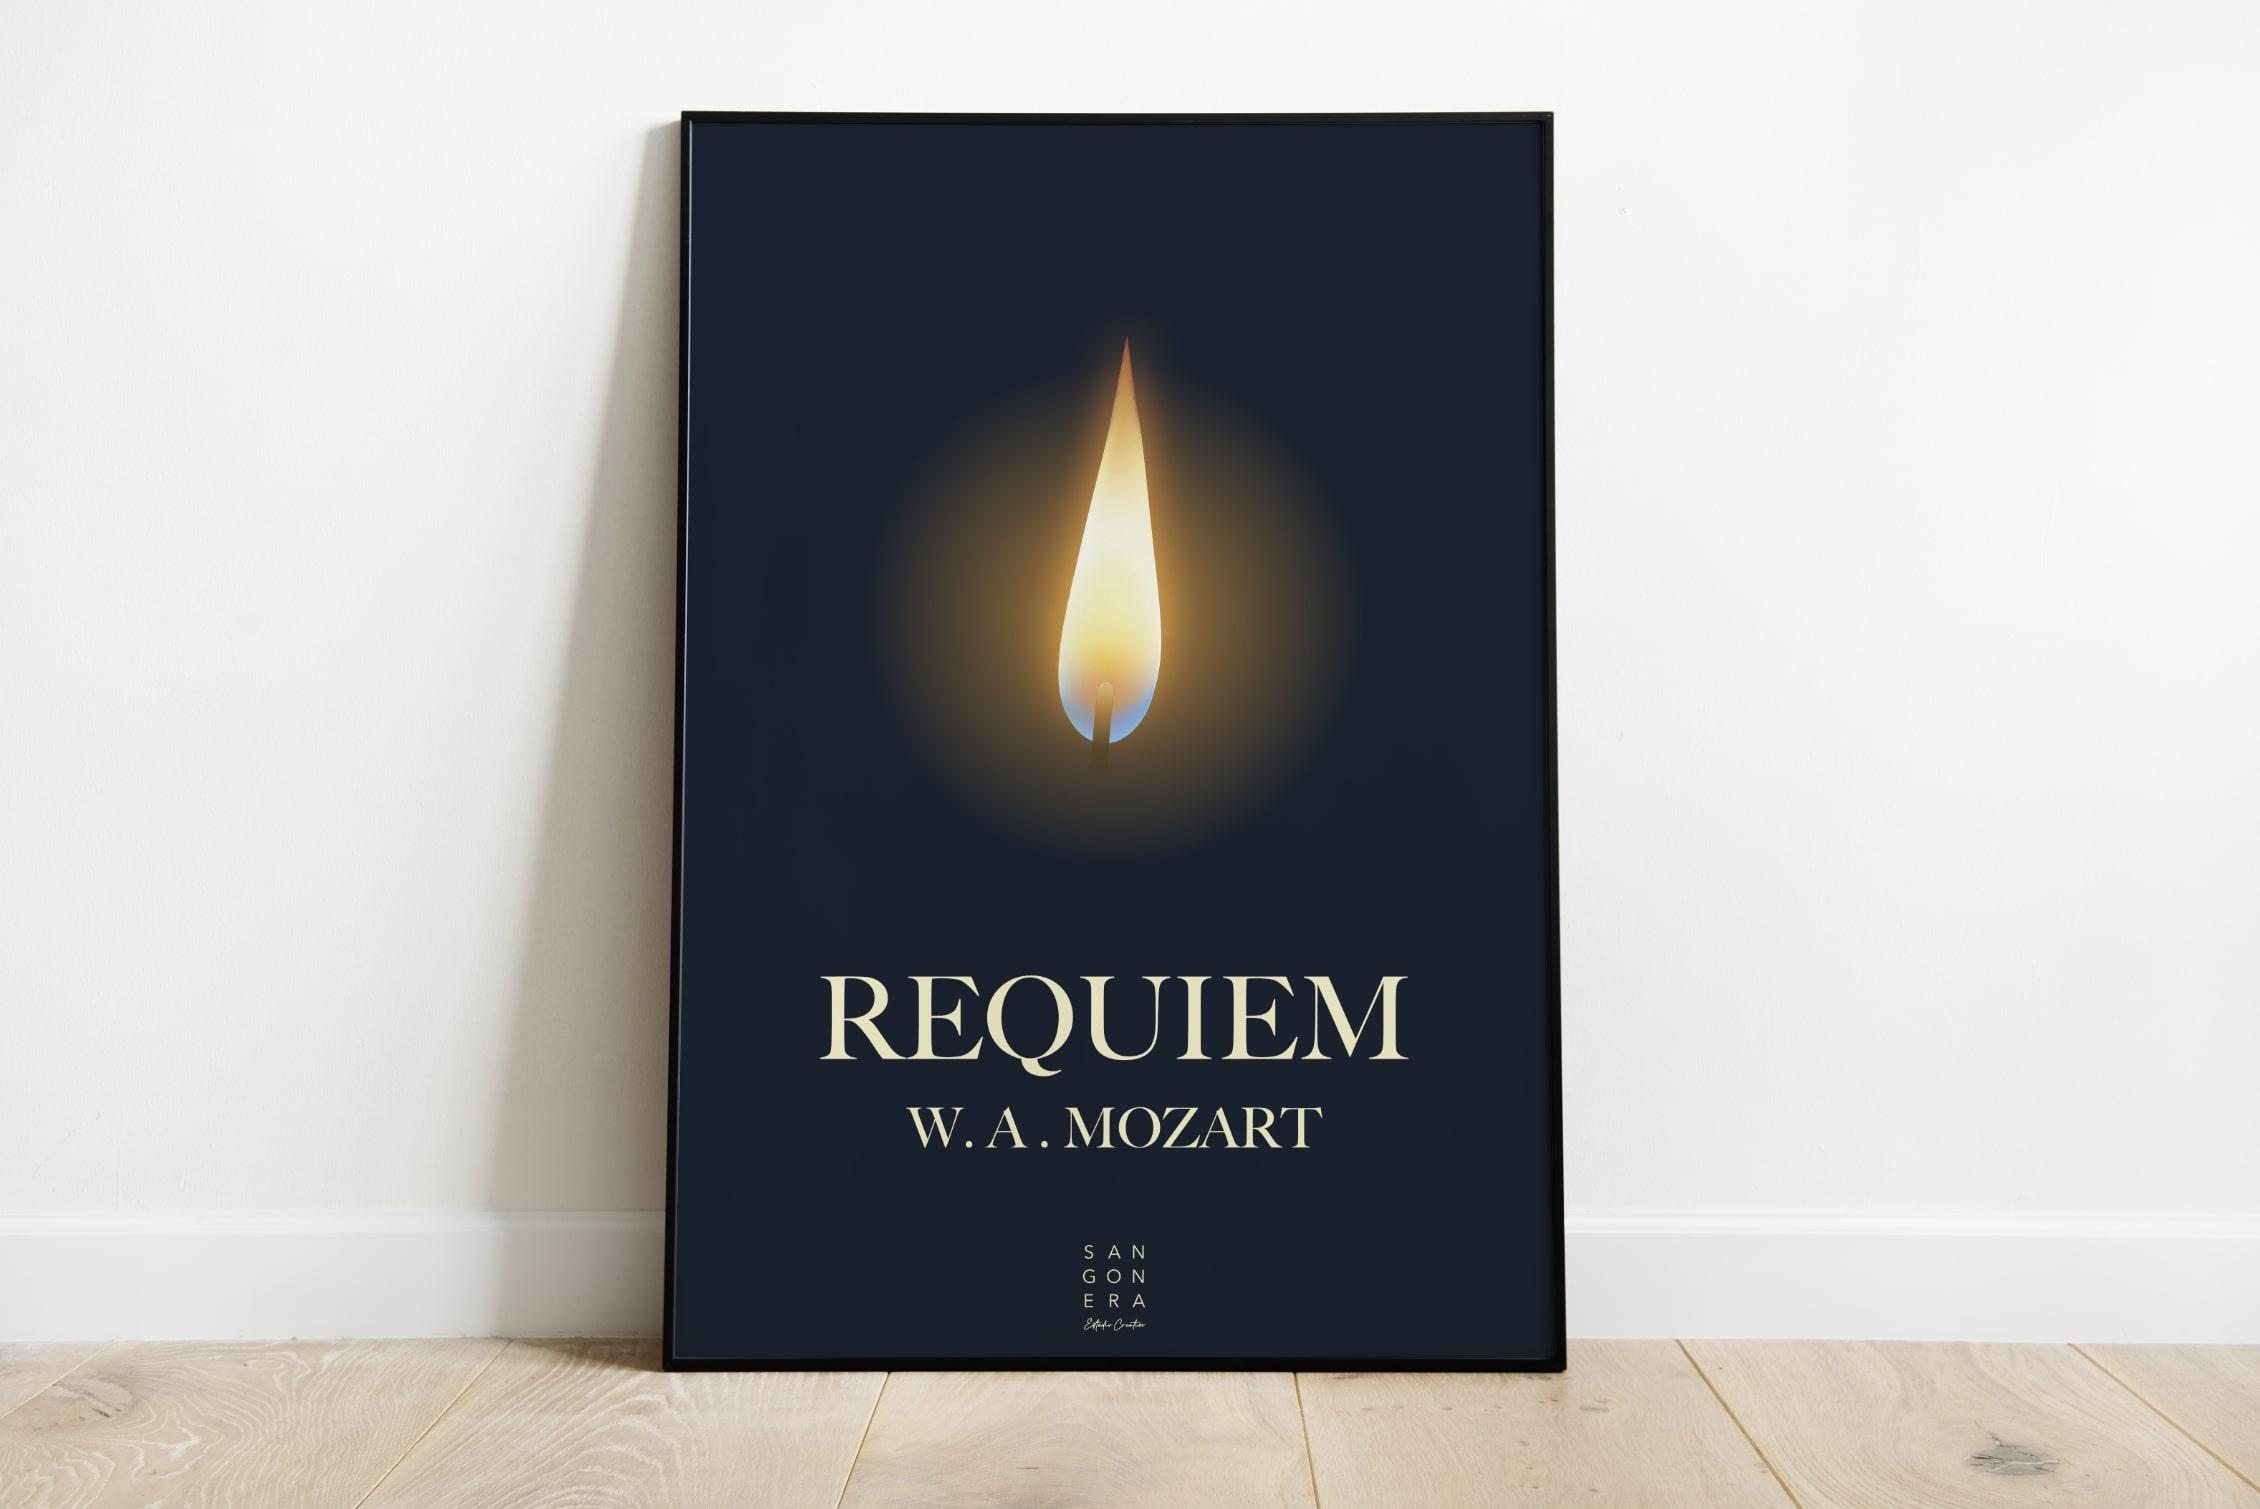 Cartel Requiem W.A. Mozart, Sangonera Design